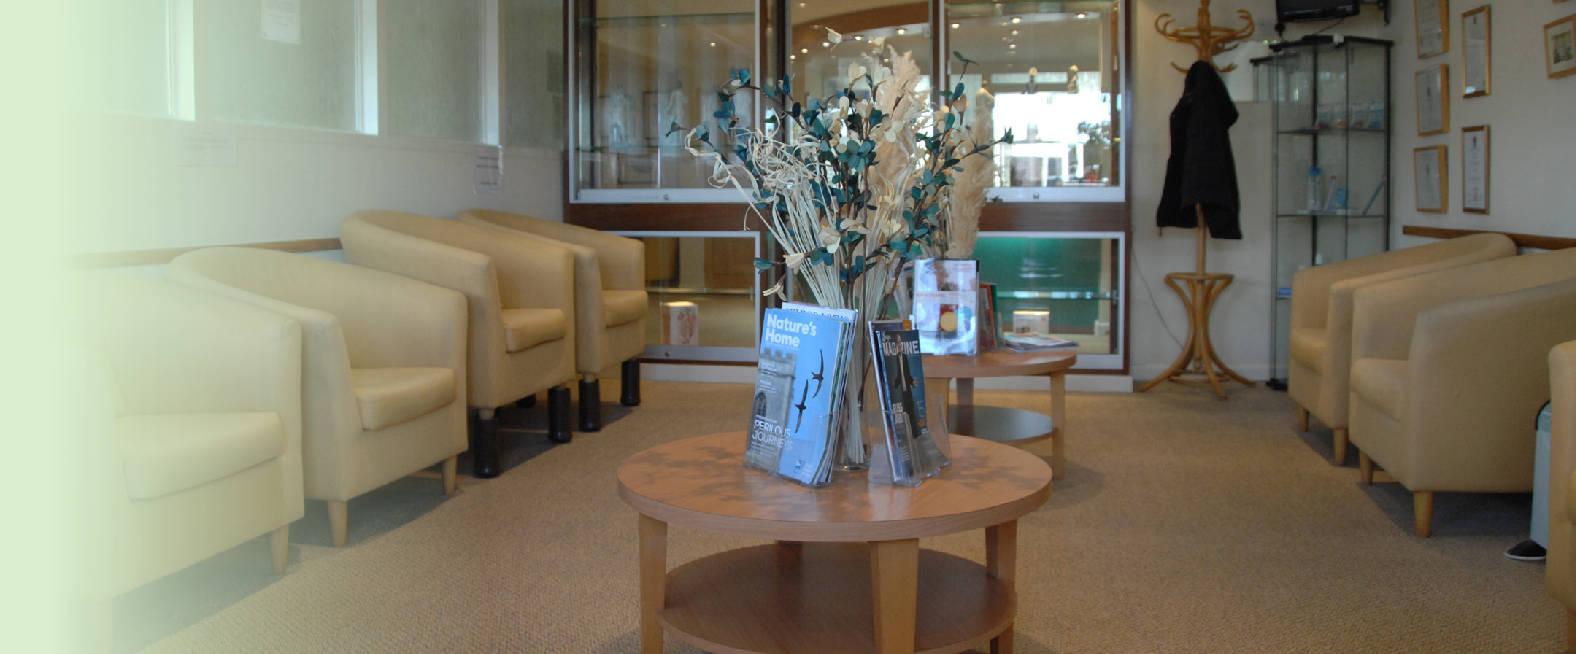 The dental centre ferndown waiting area